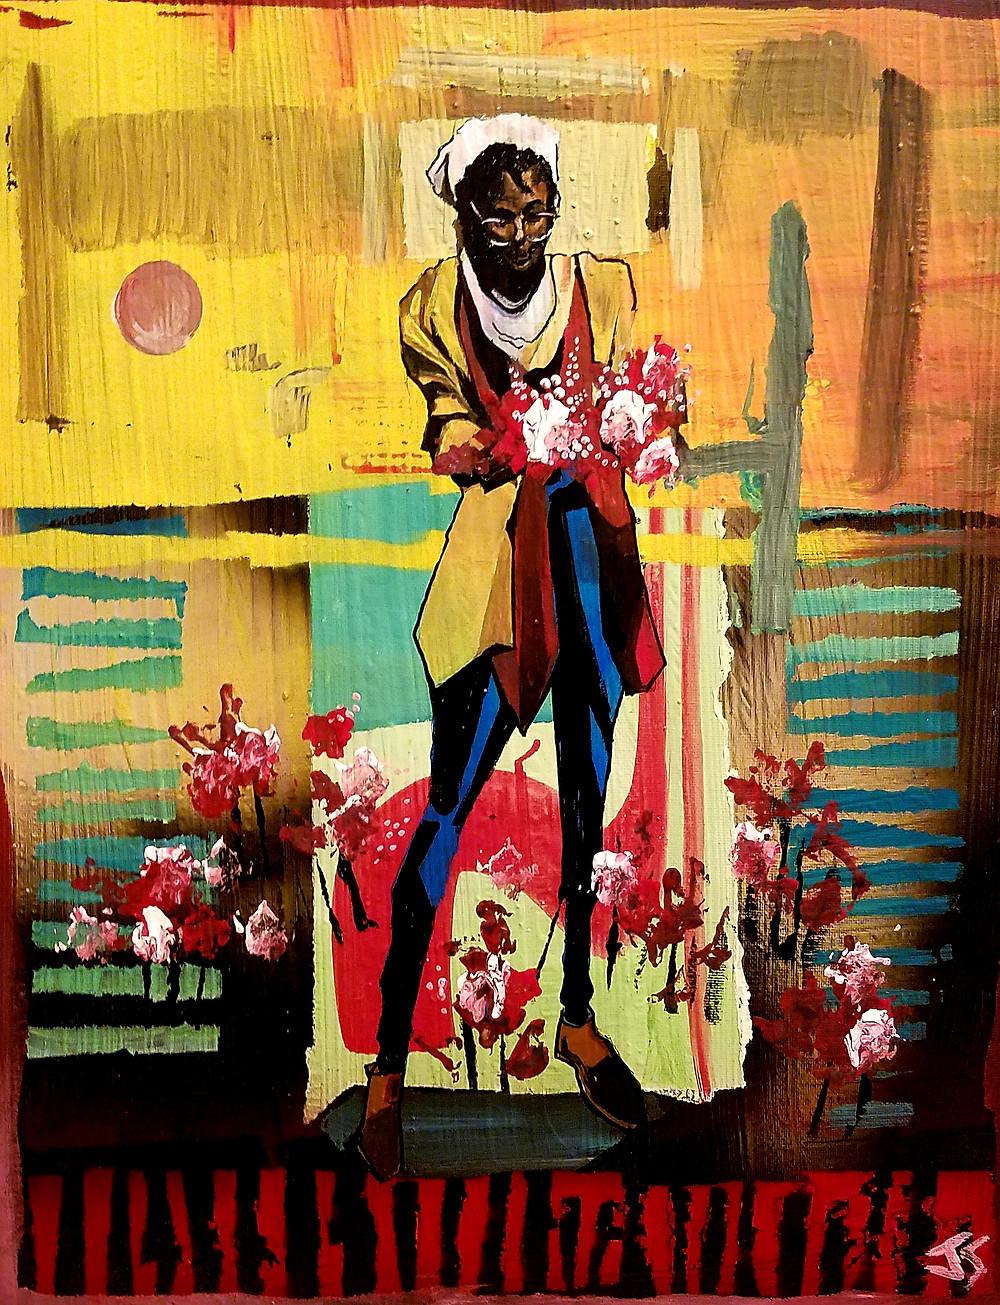 Painting by Fayetteville Artist Joelle Storet